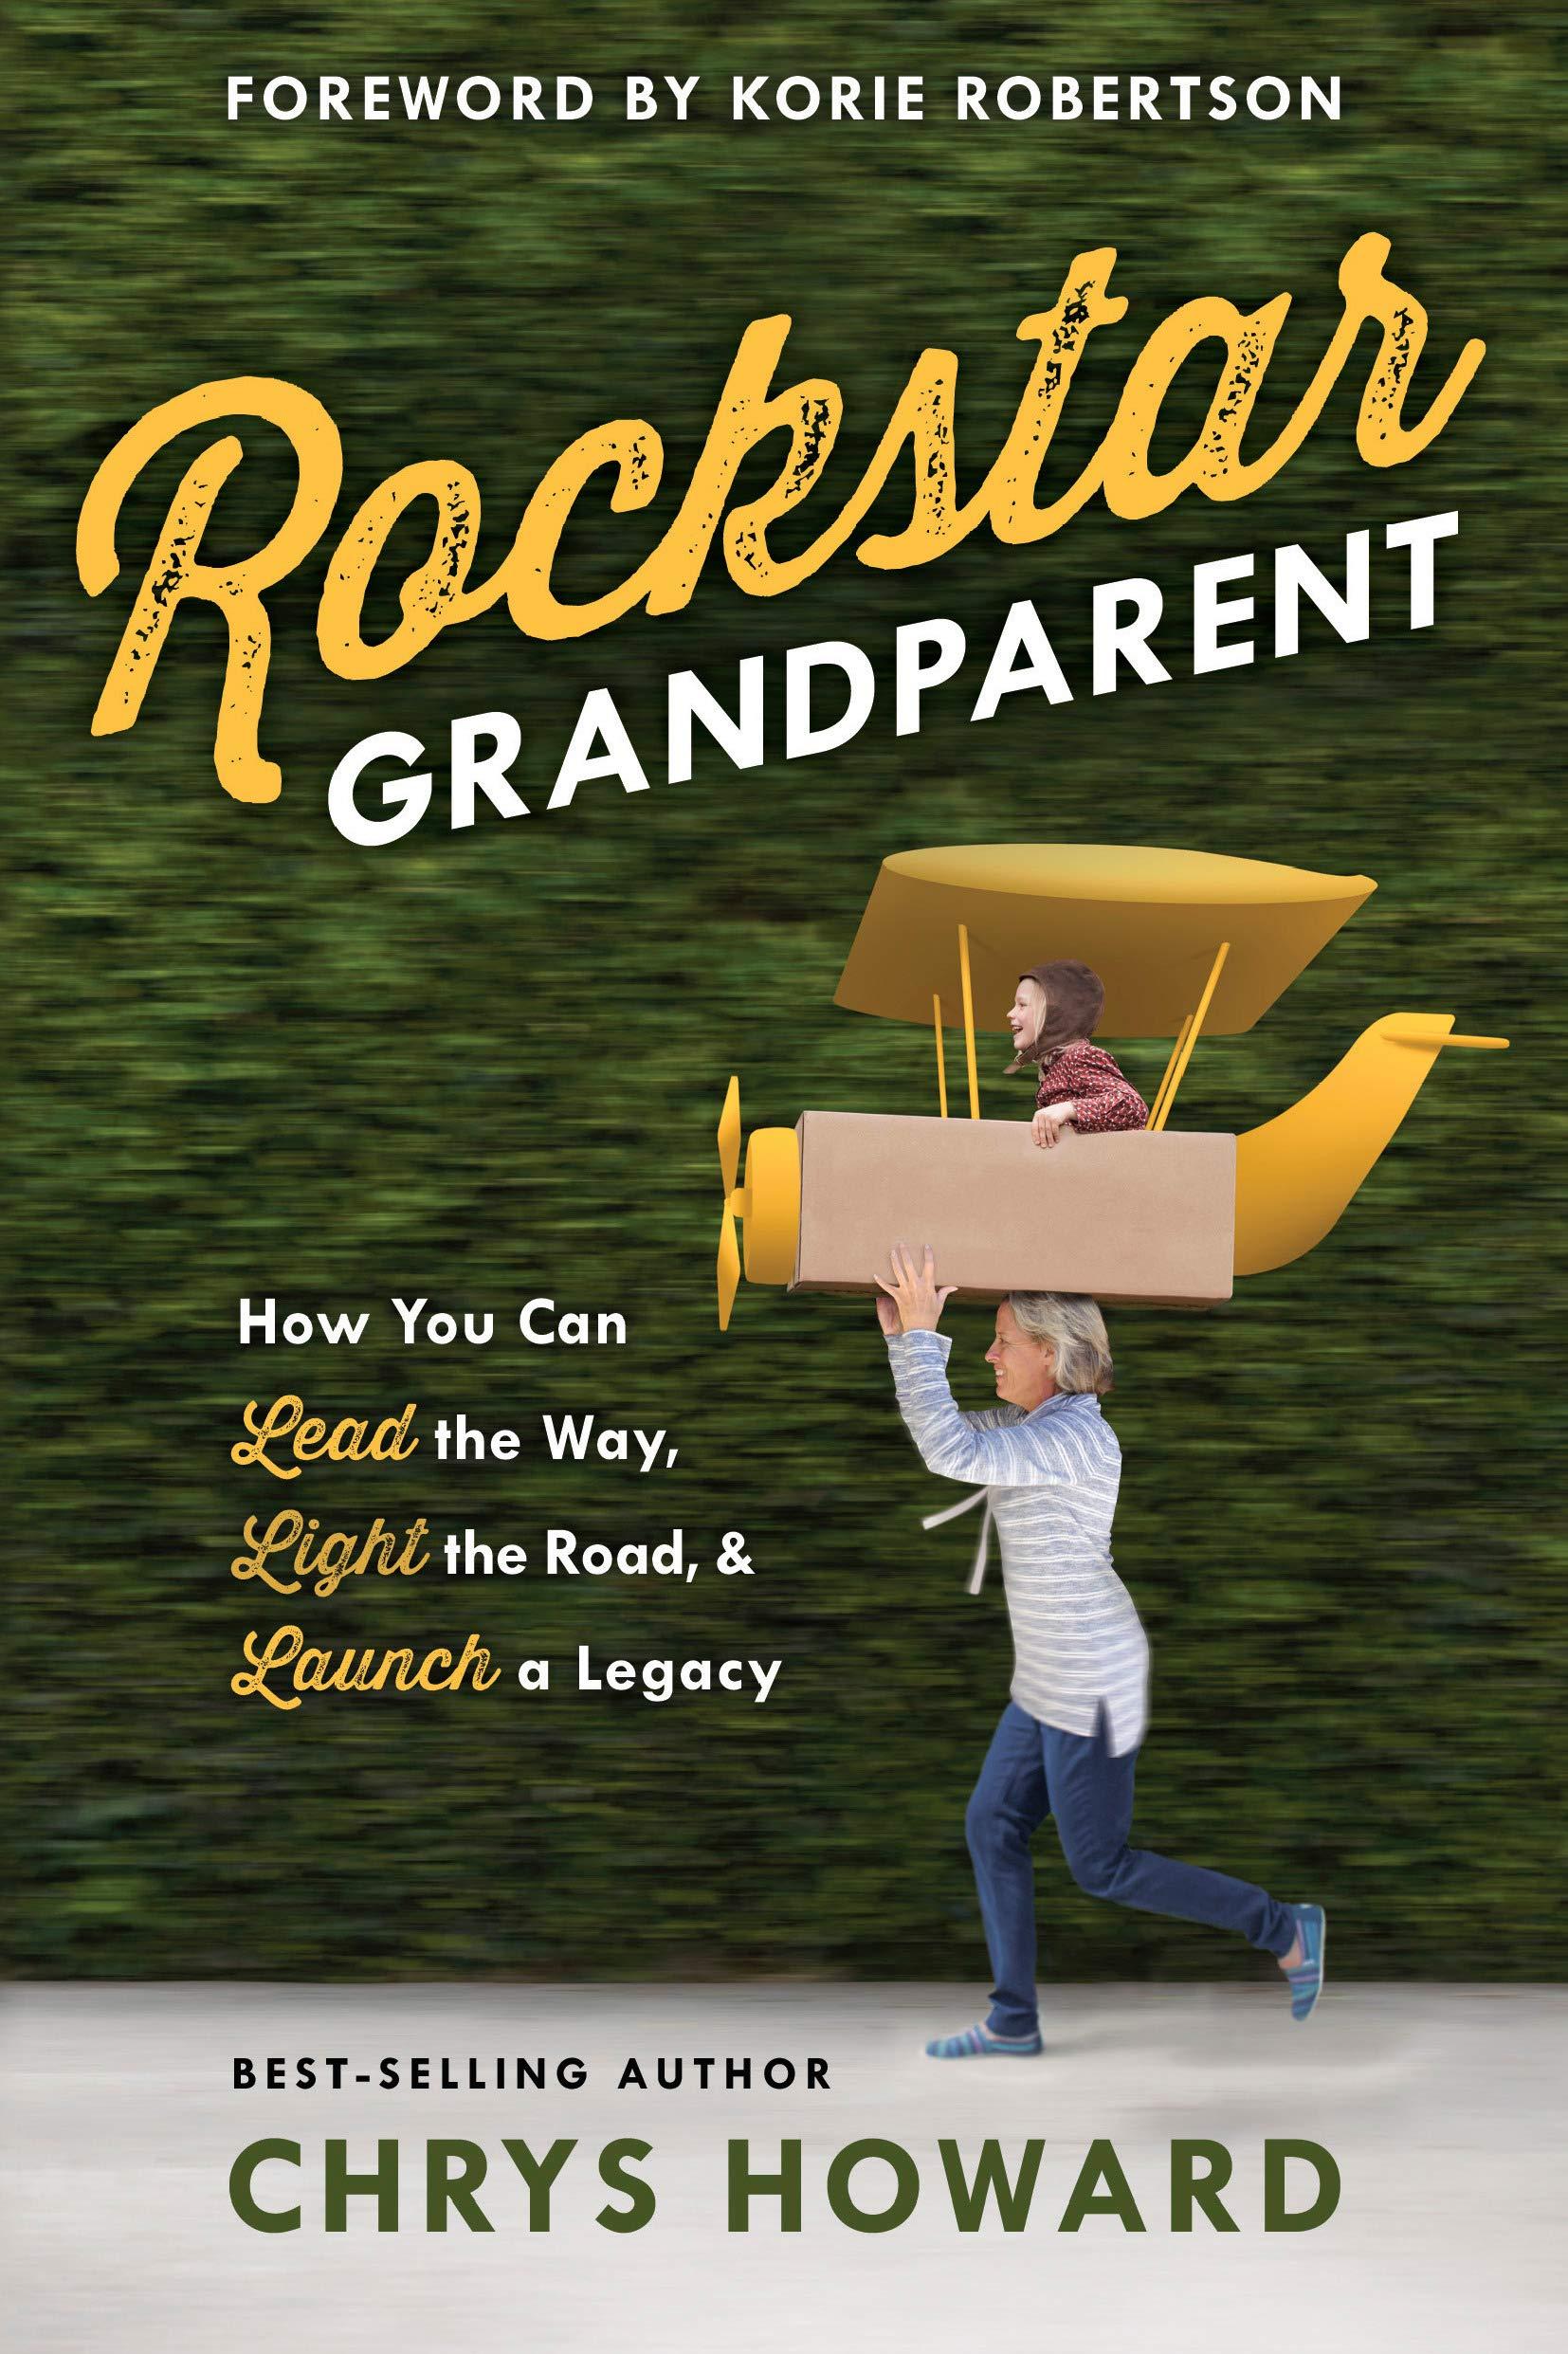 Rockstar Grandparent Light Launch Legacy product image